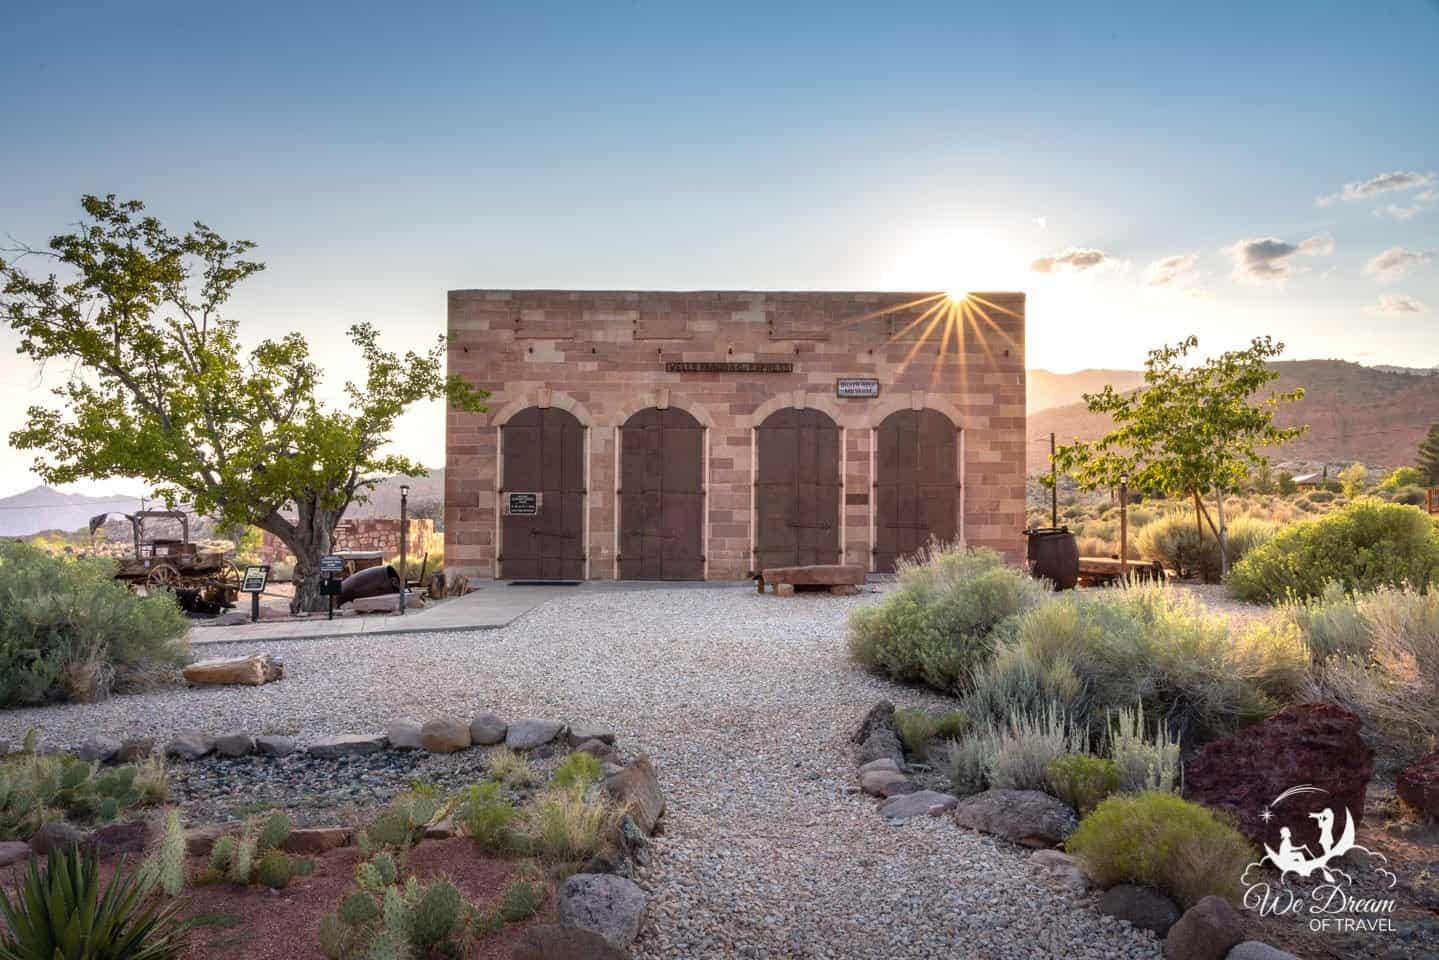 Wells Fargo building and museum in Silver Reef Ghost Town Utah